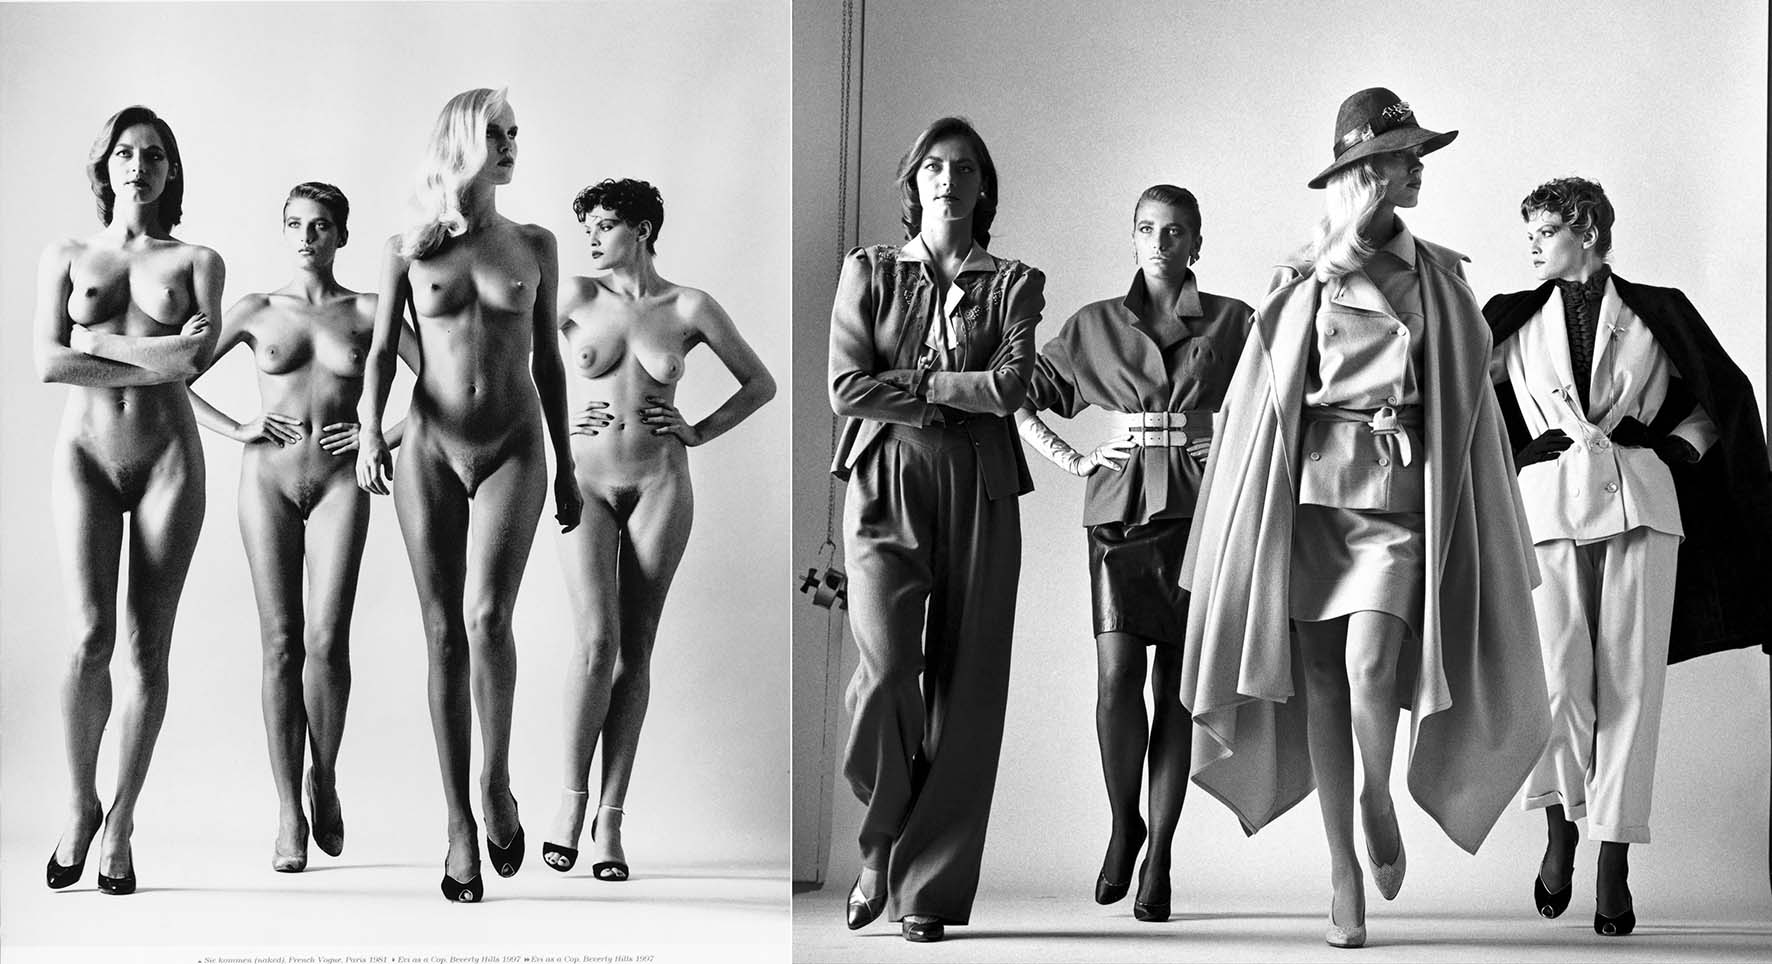 helmut newton siekommenn nude paris 1981